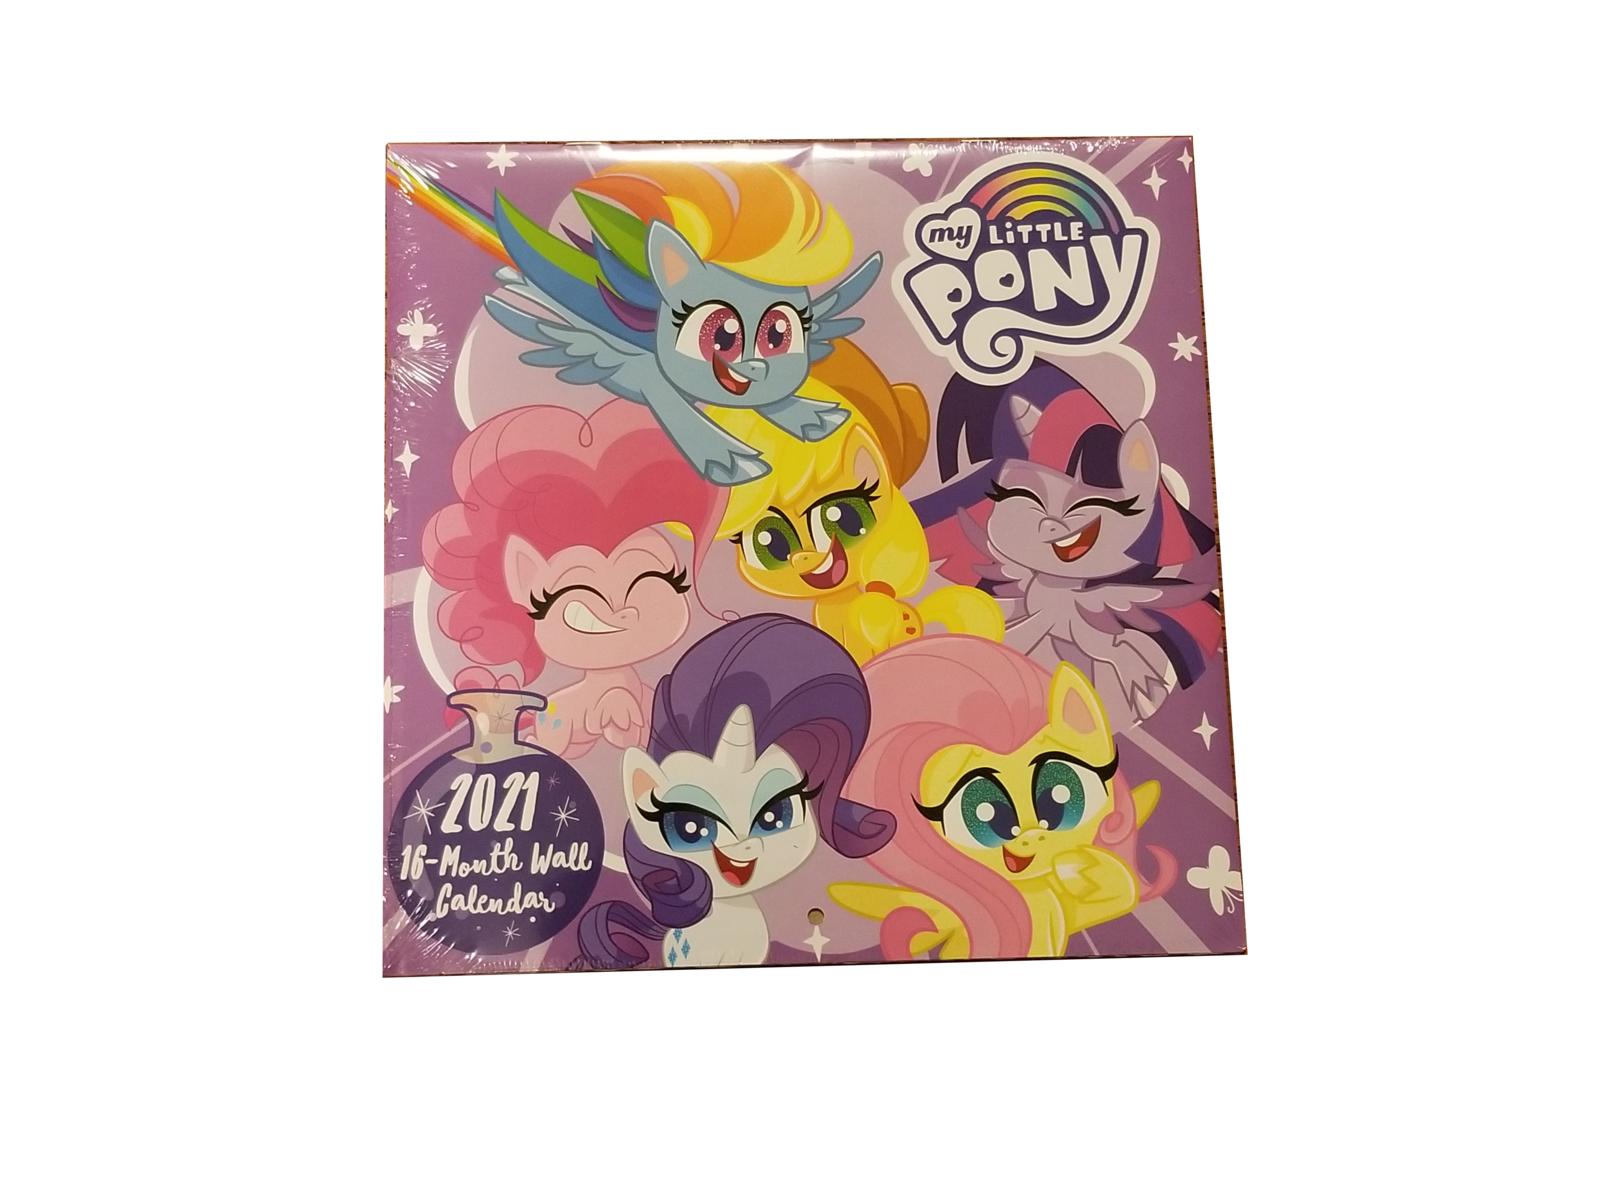 My little pony 2011 16 month calendar